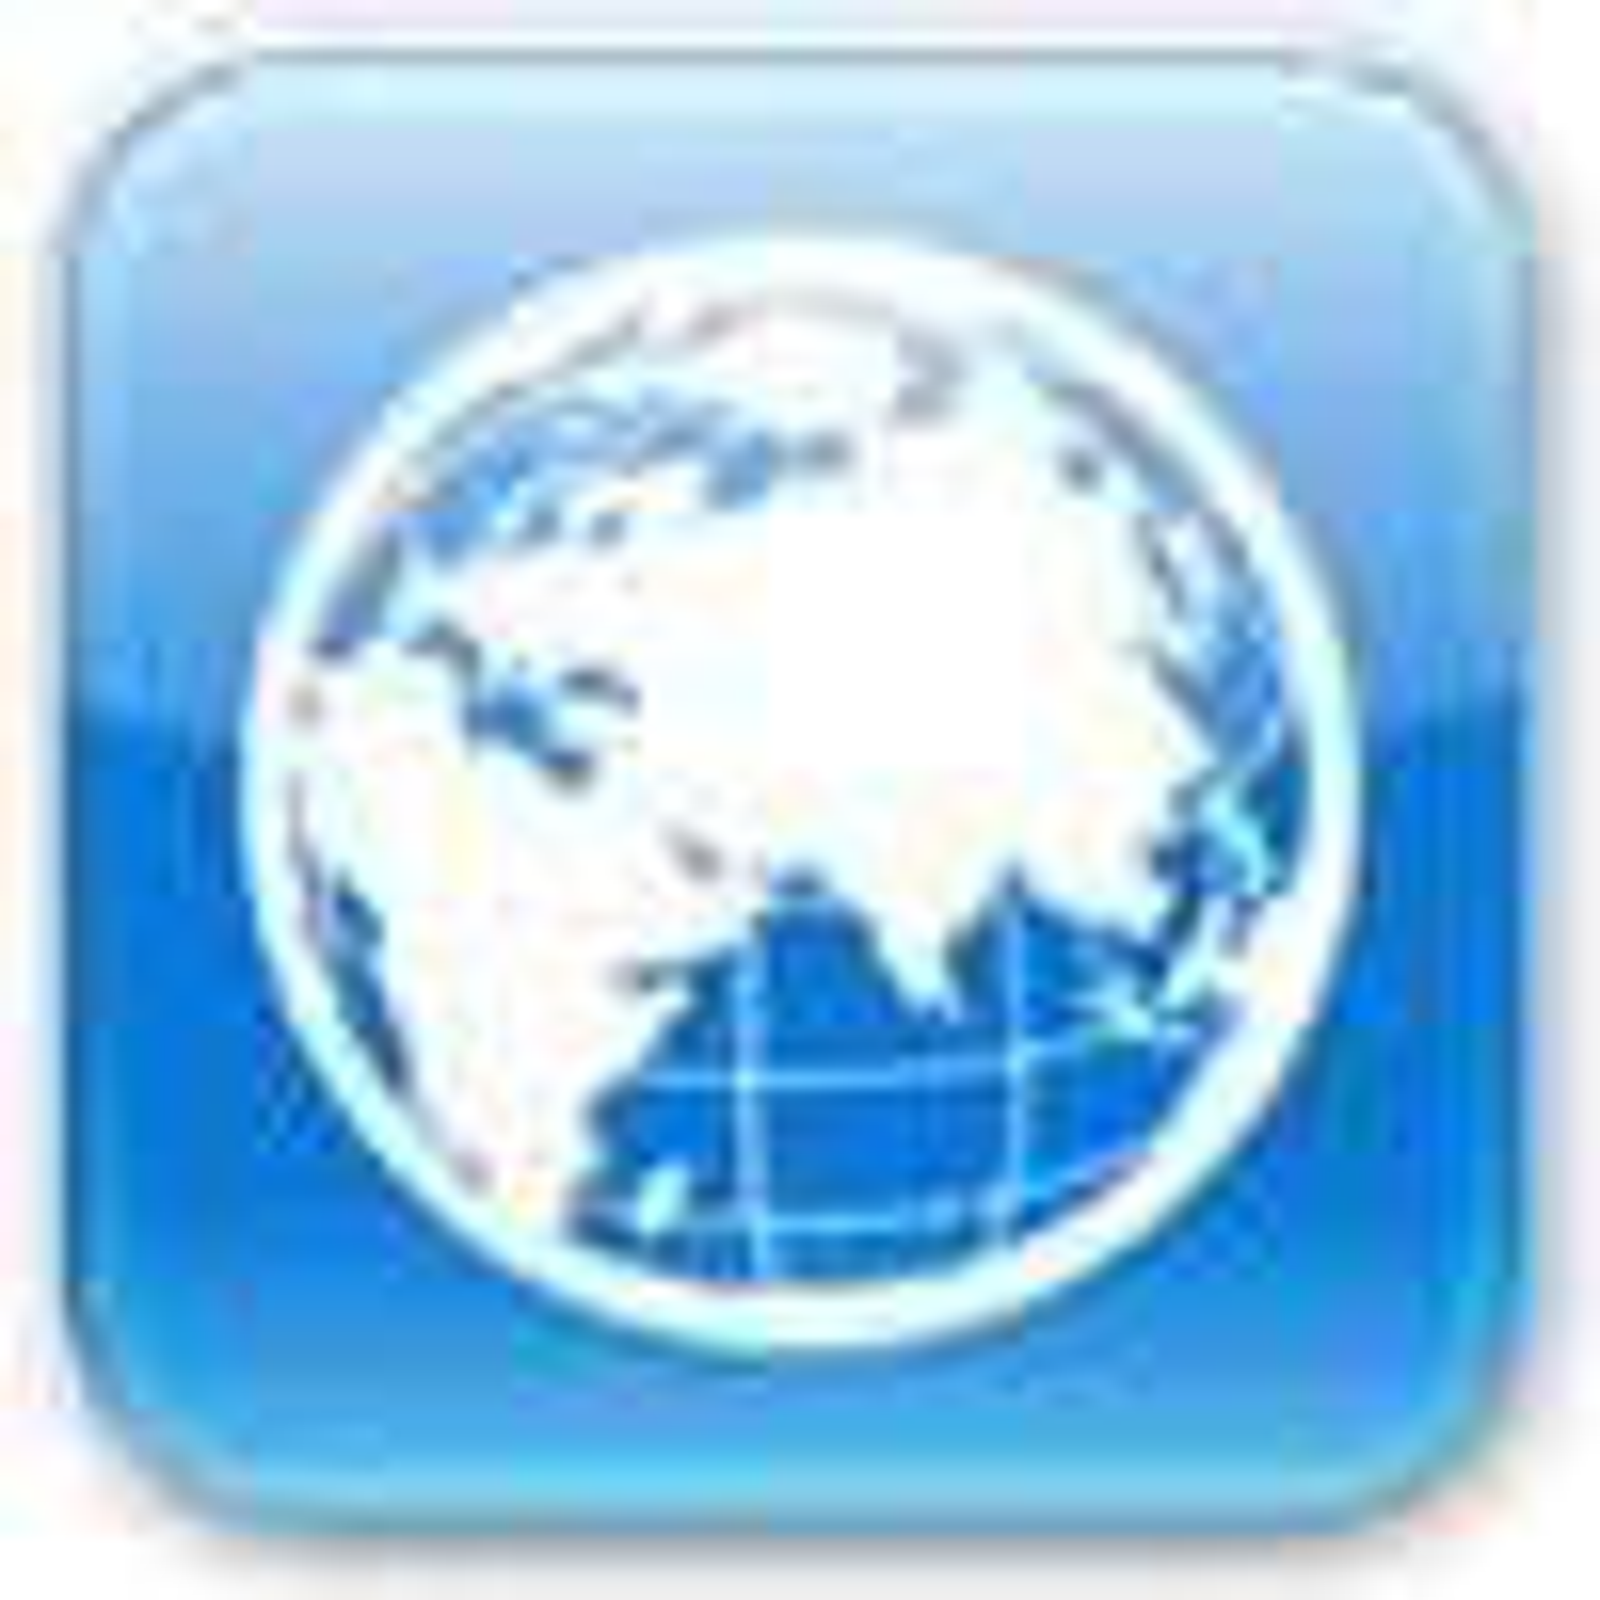 World Customs & Cultures